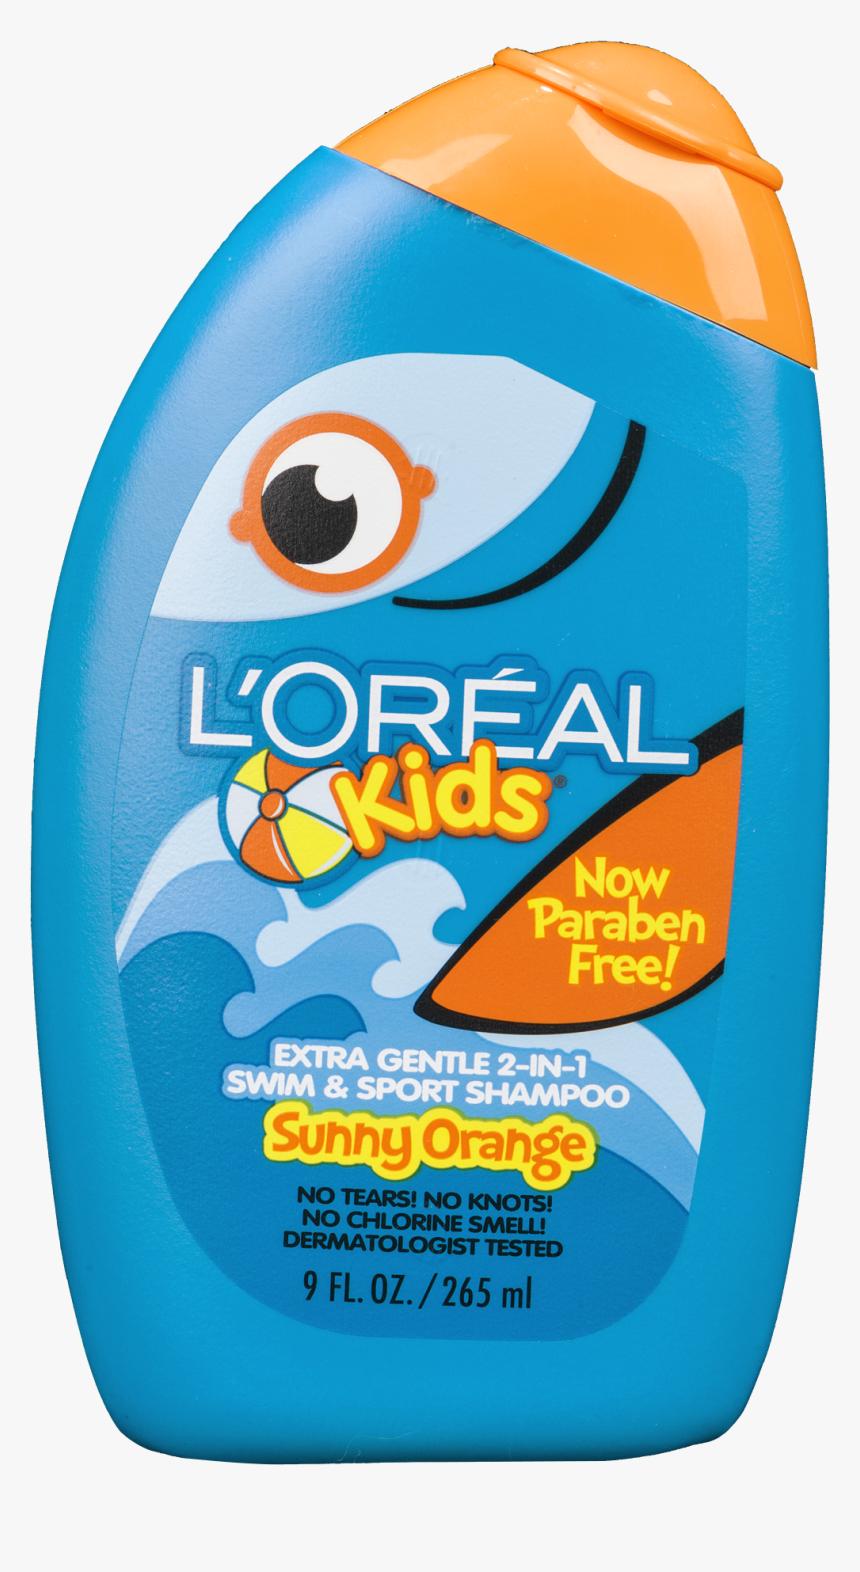 "L""oreal Paris Kids 2 In 1 Extra Gentle Shampoo, Splash - Loreal Shampoo Kids, HD Png Download, Free Download"